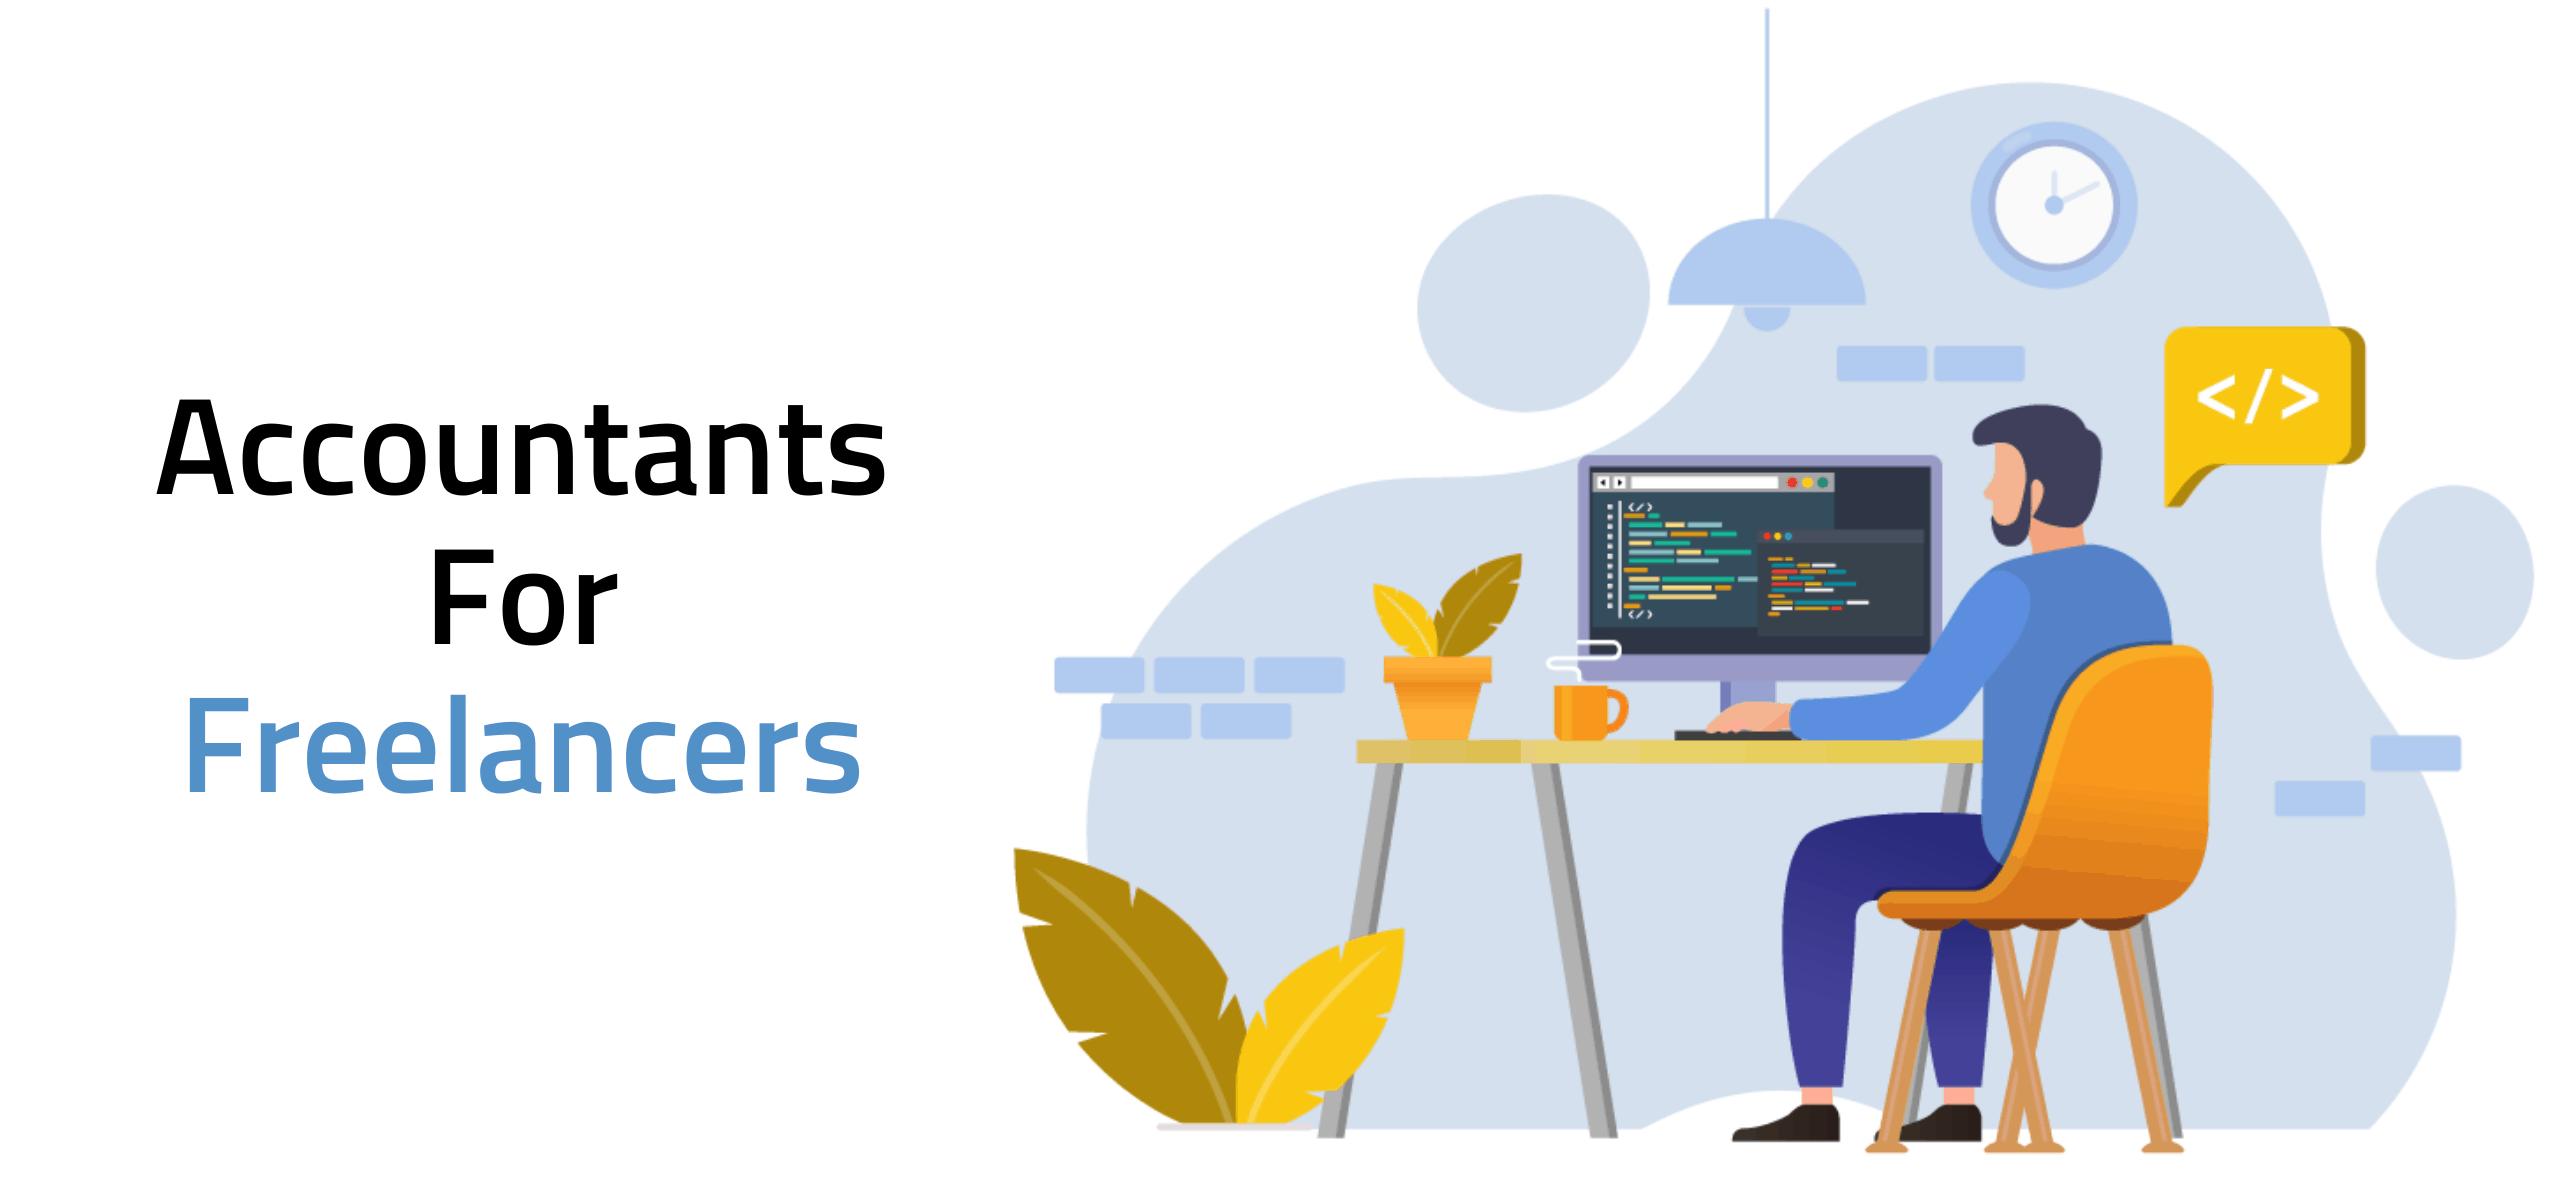 Accountants for Freelancer